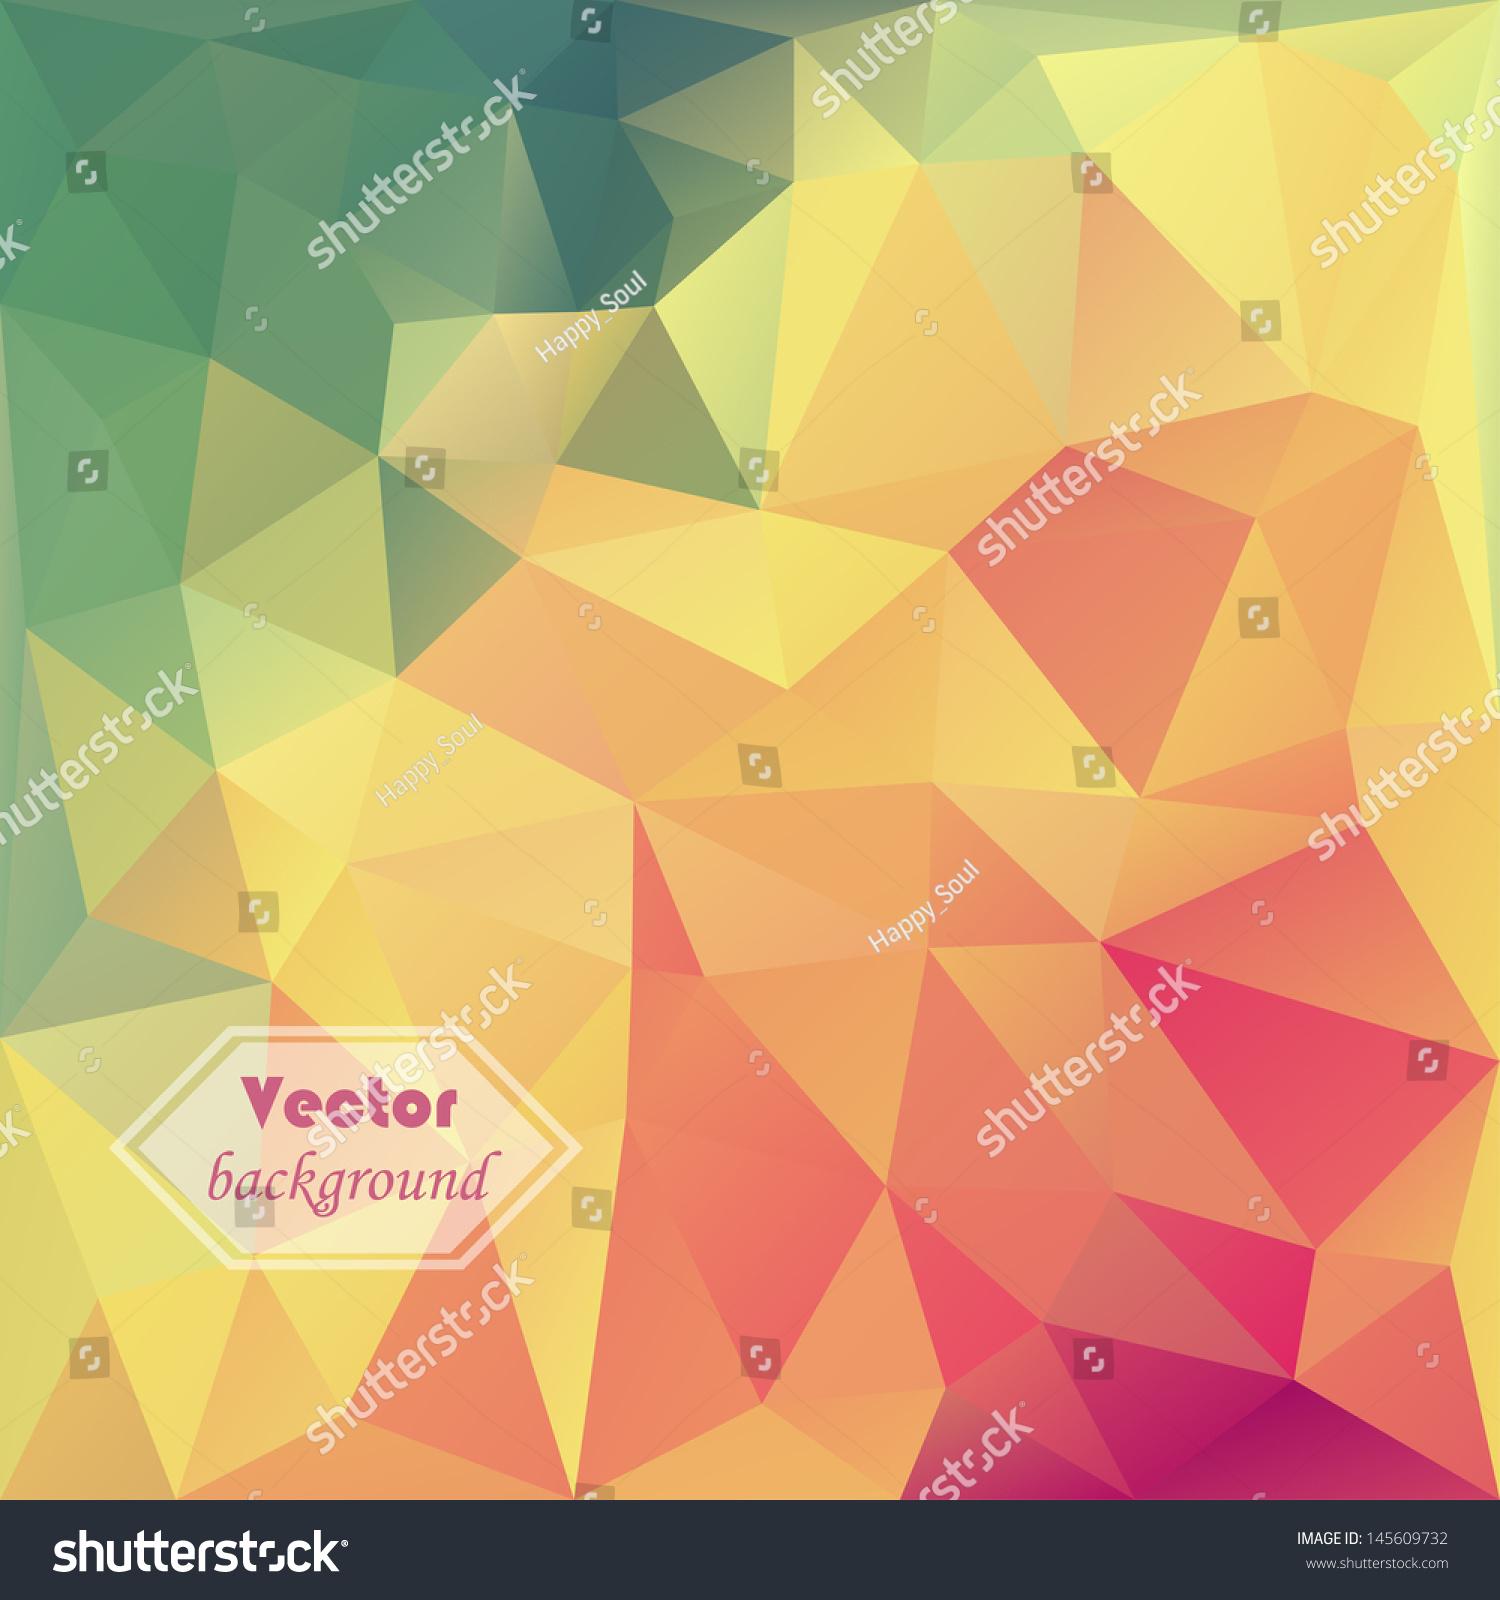 Geometric Pattern Images Stock Photos amp Vectors